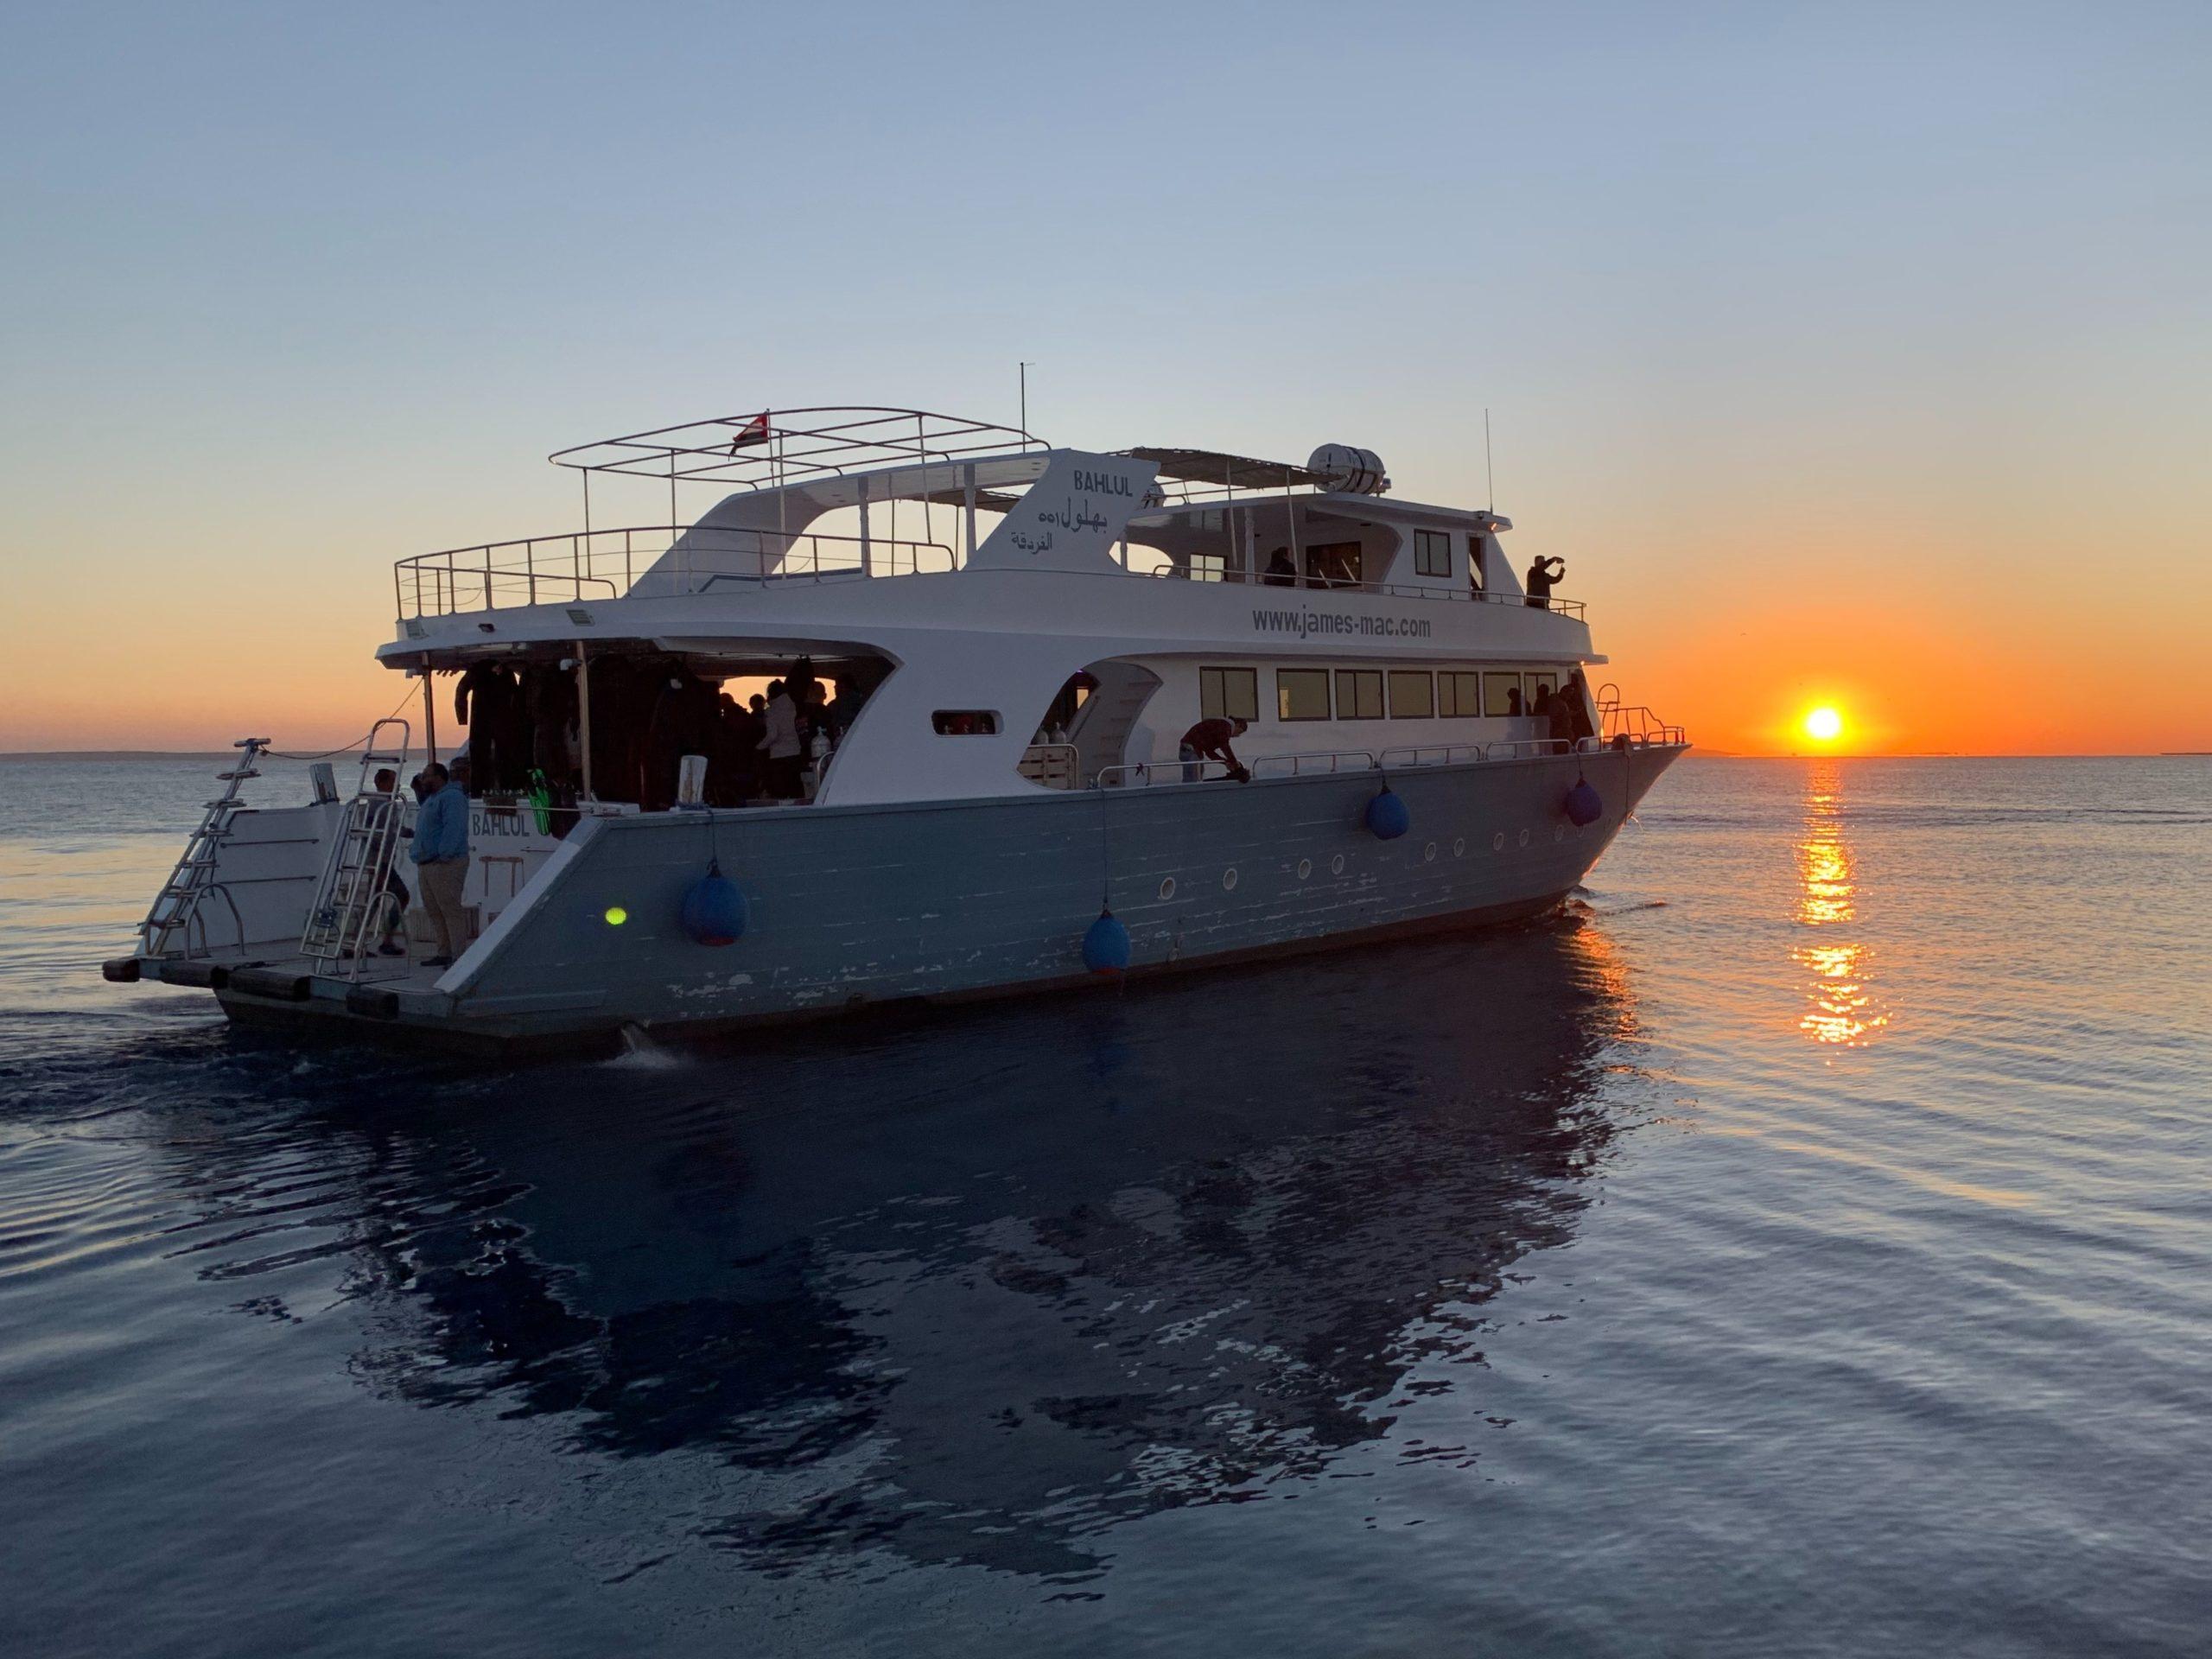 bahlul-sunset